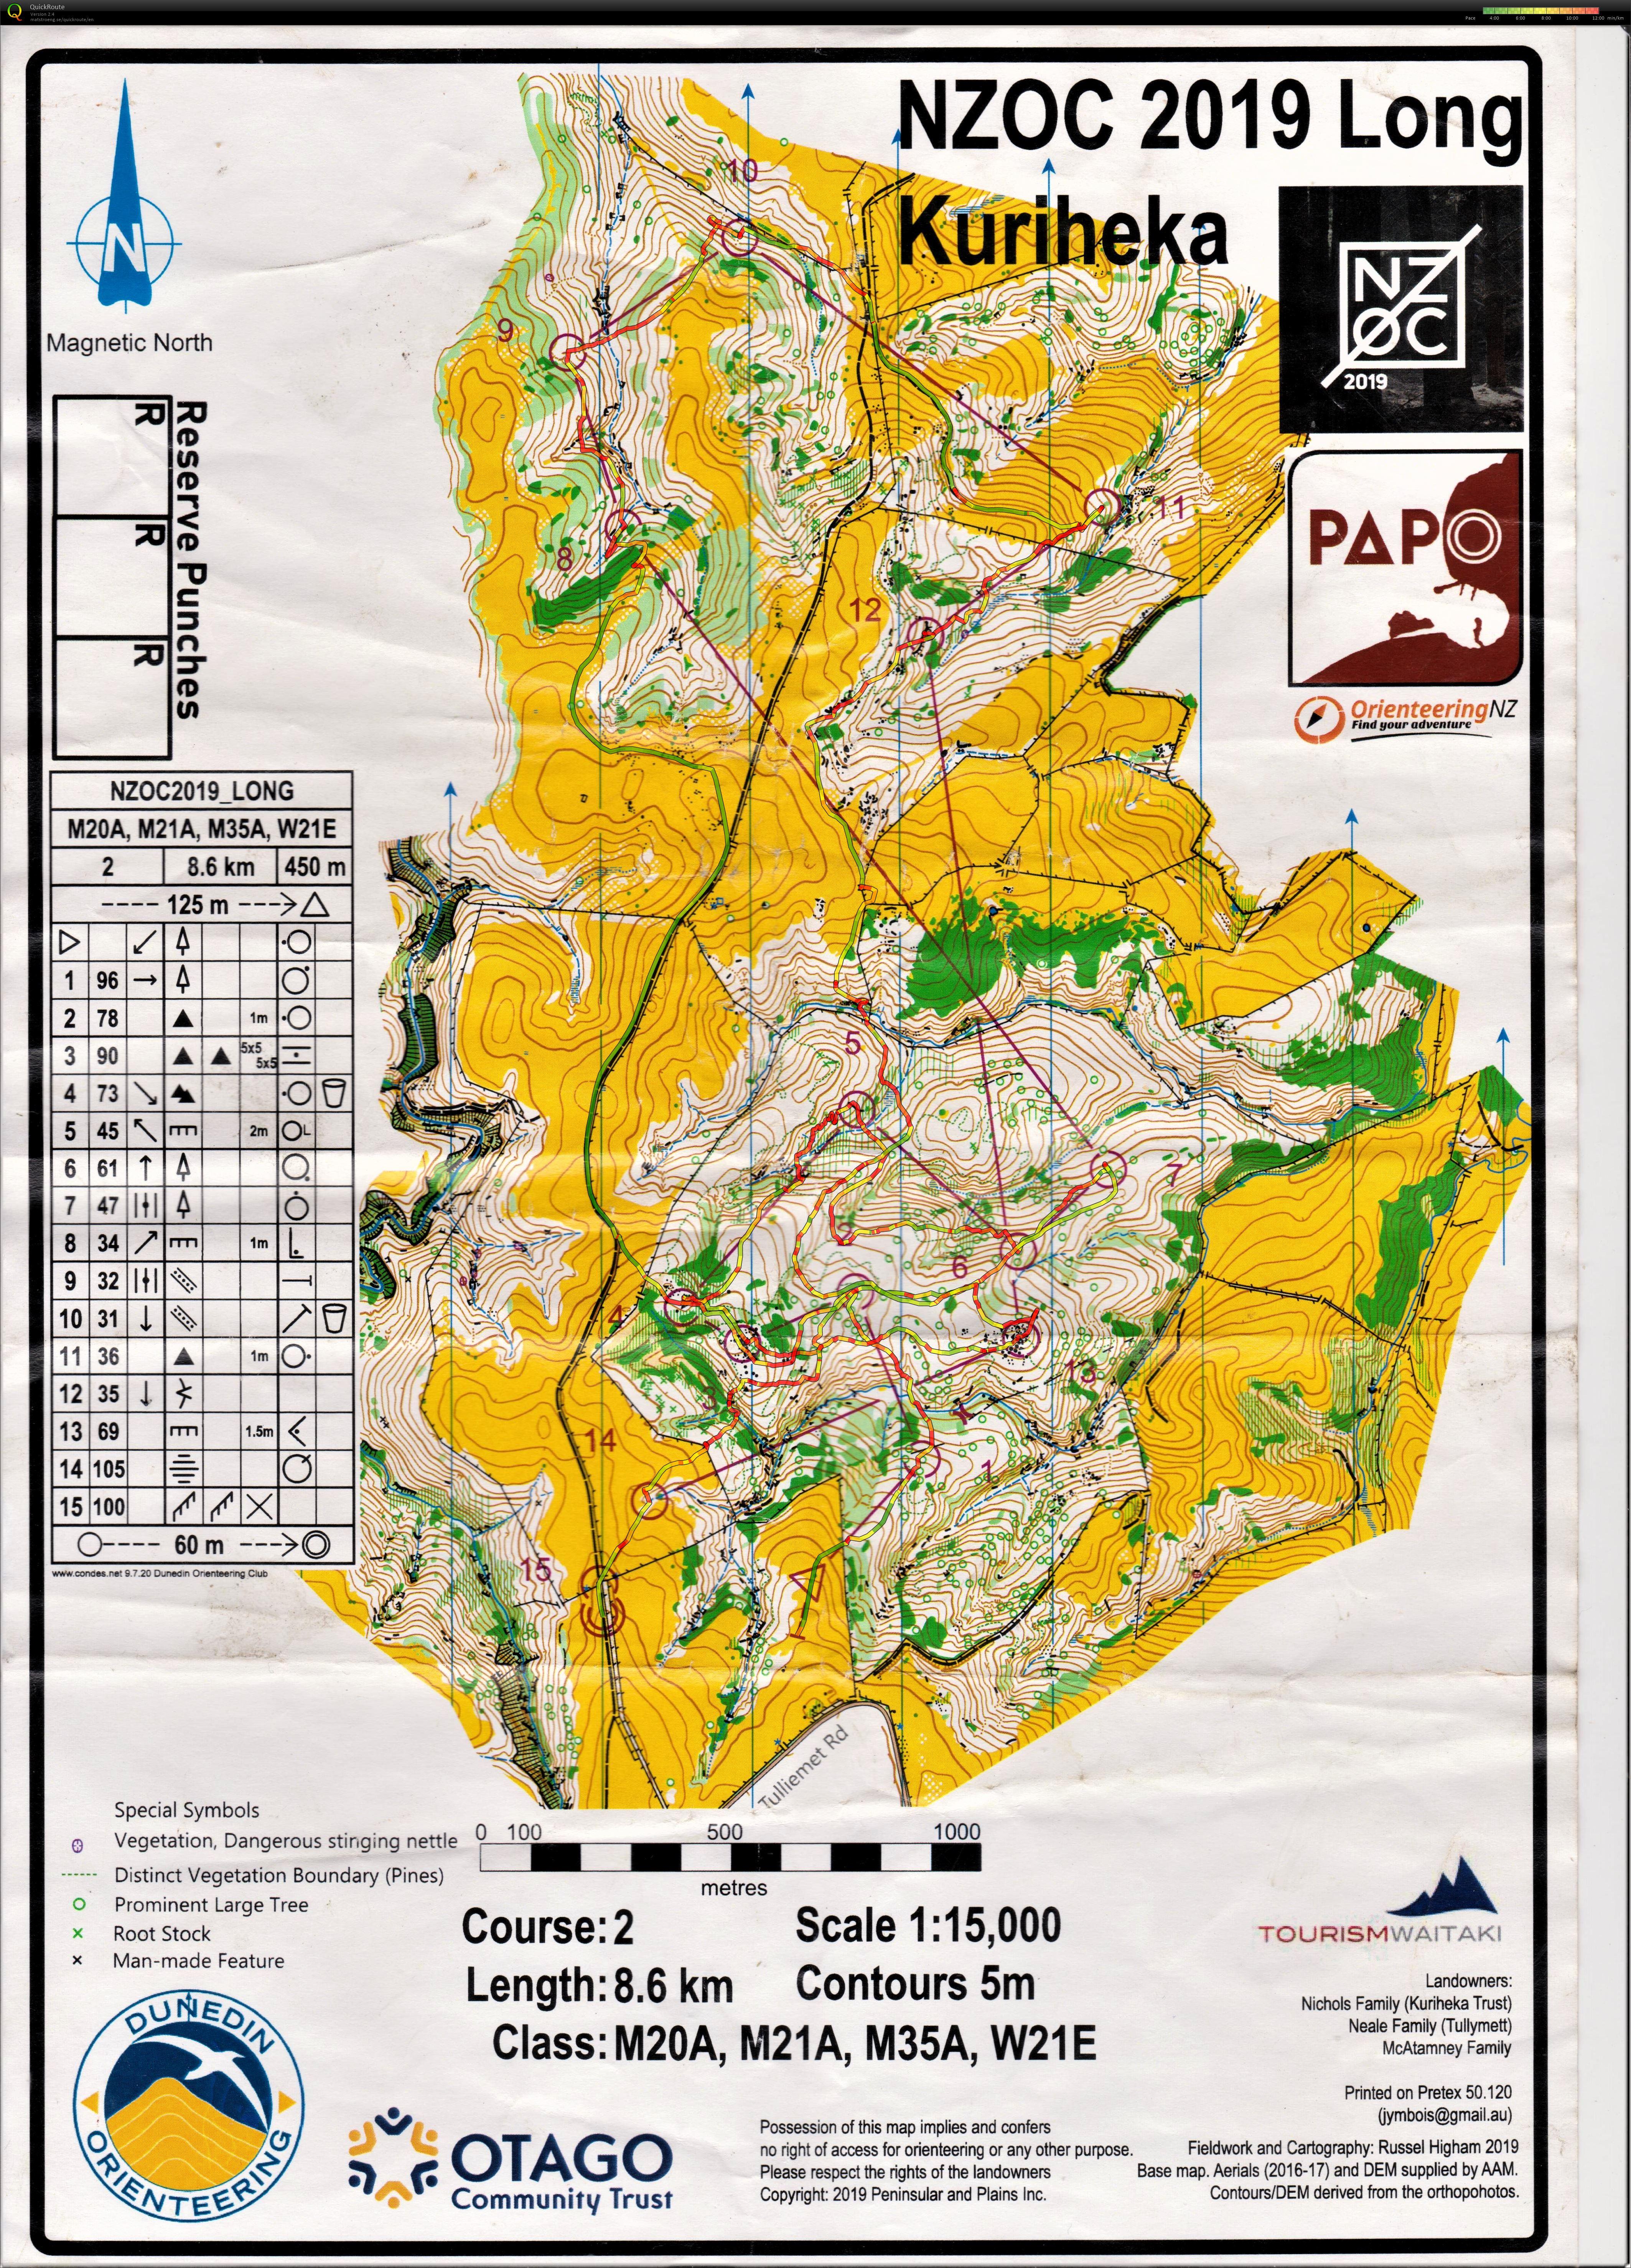 Thomas' digital orienteering map archive :: NZOC 2019 Long